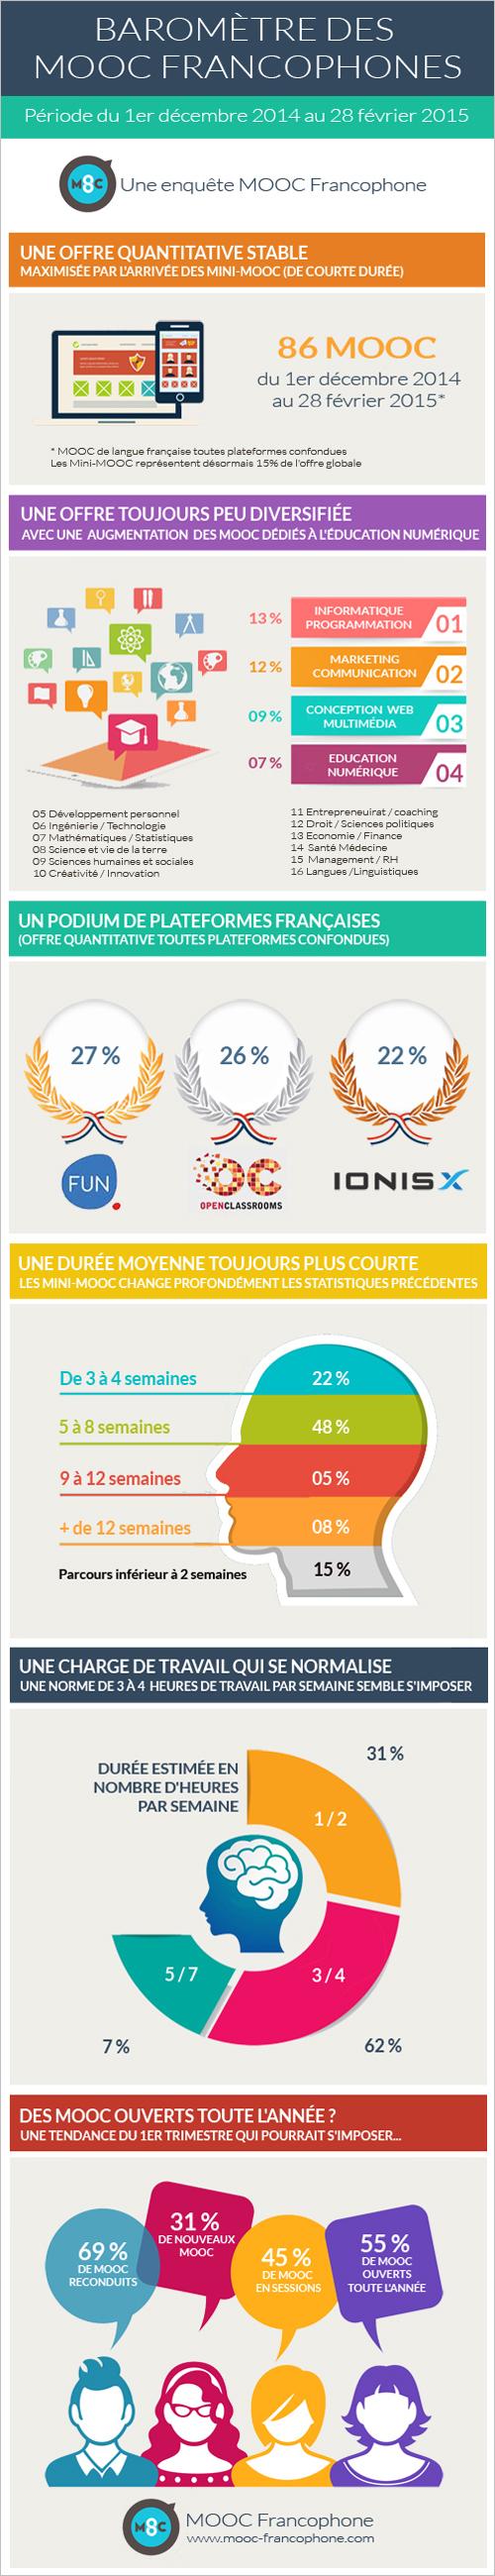 2e-baromètre-trimestriel-des-MOOC-Francophone1